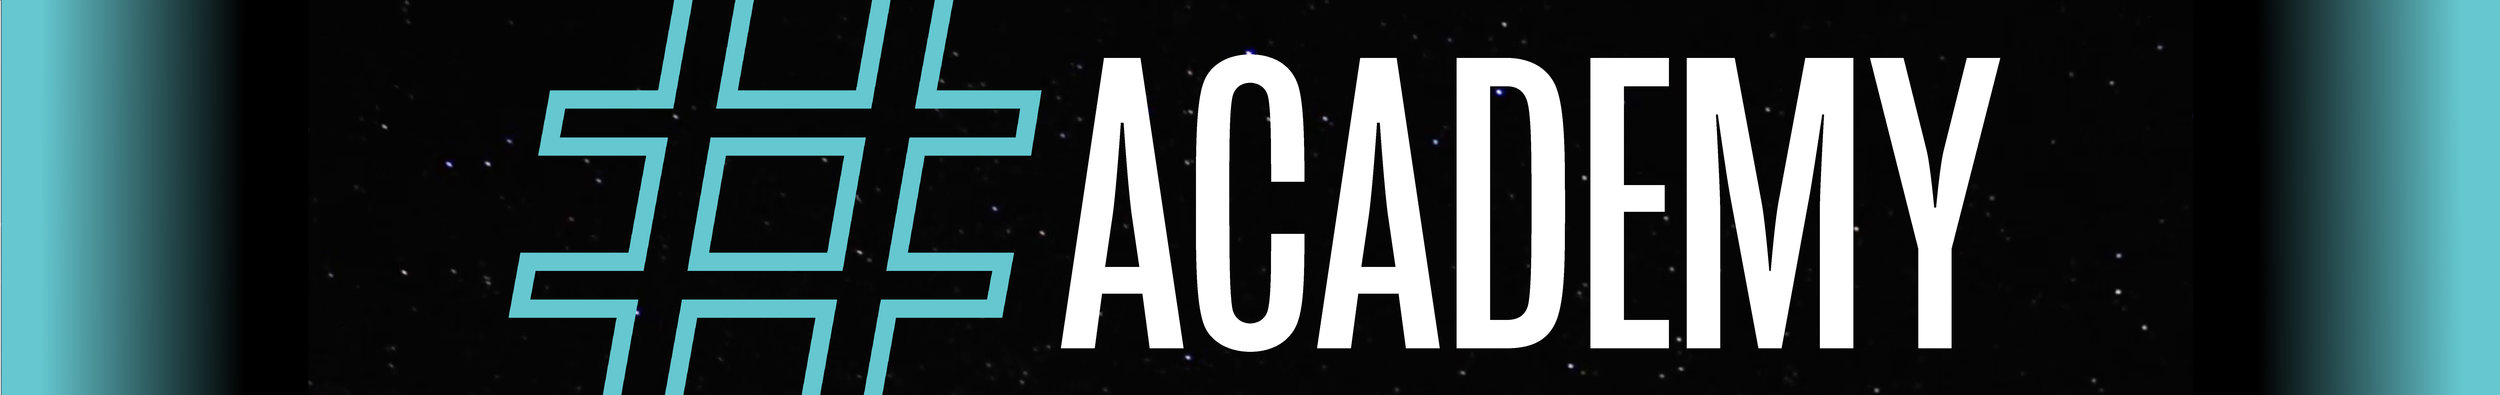 # ACADEMY BLACK COVER-01-01.jpg